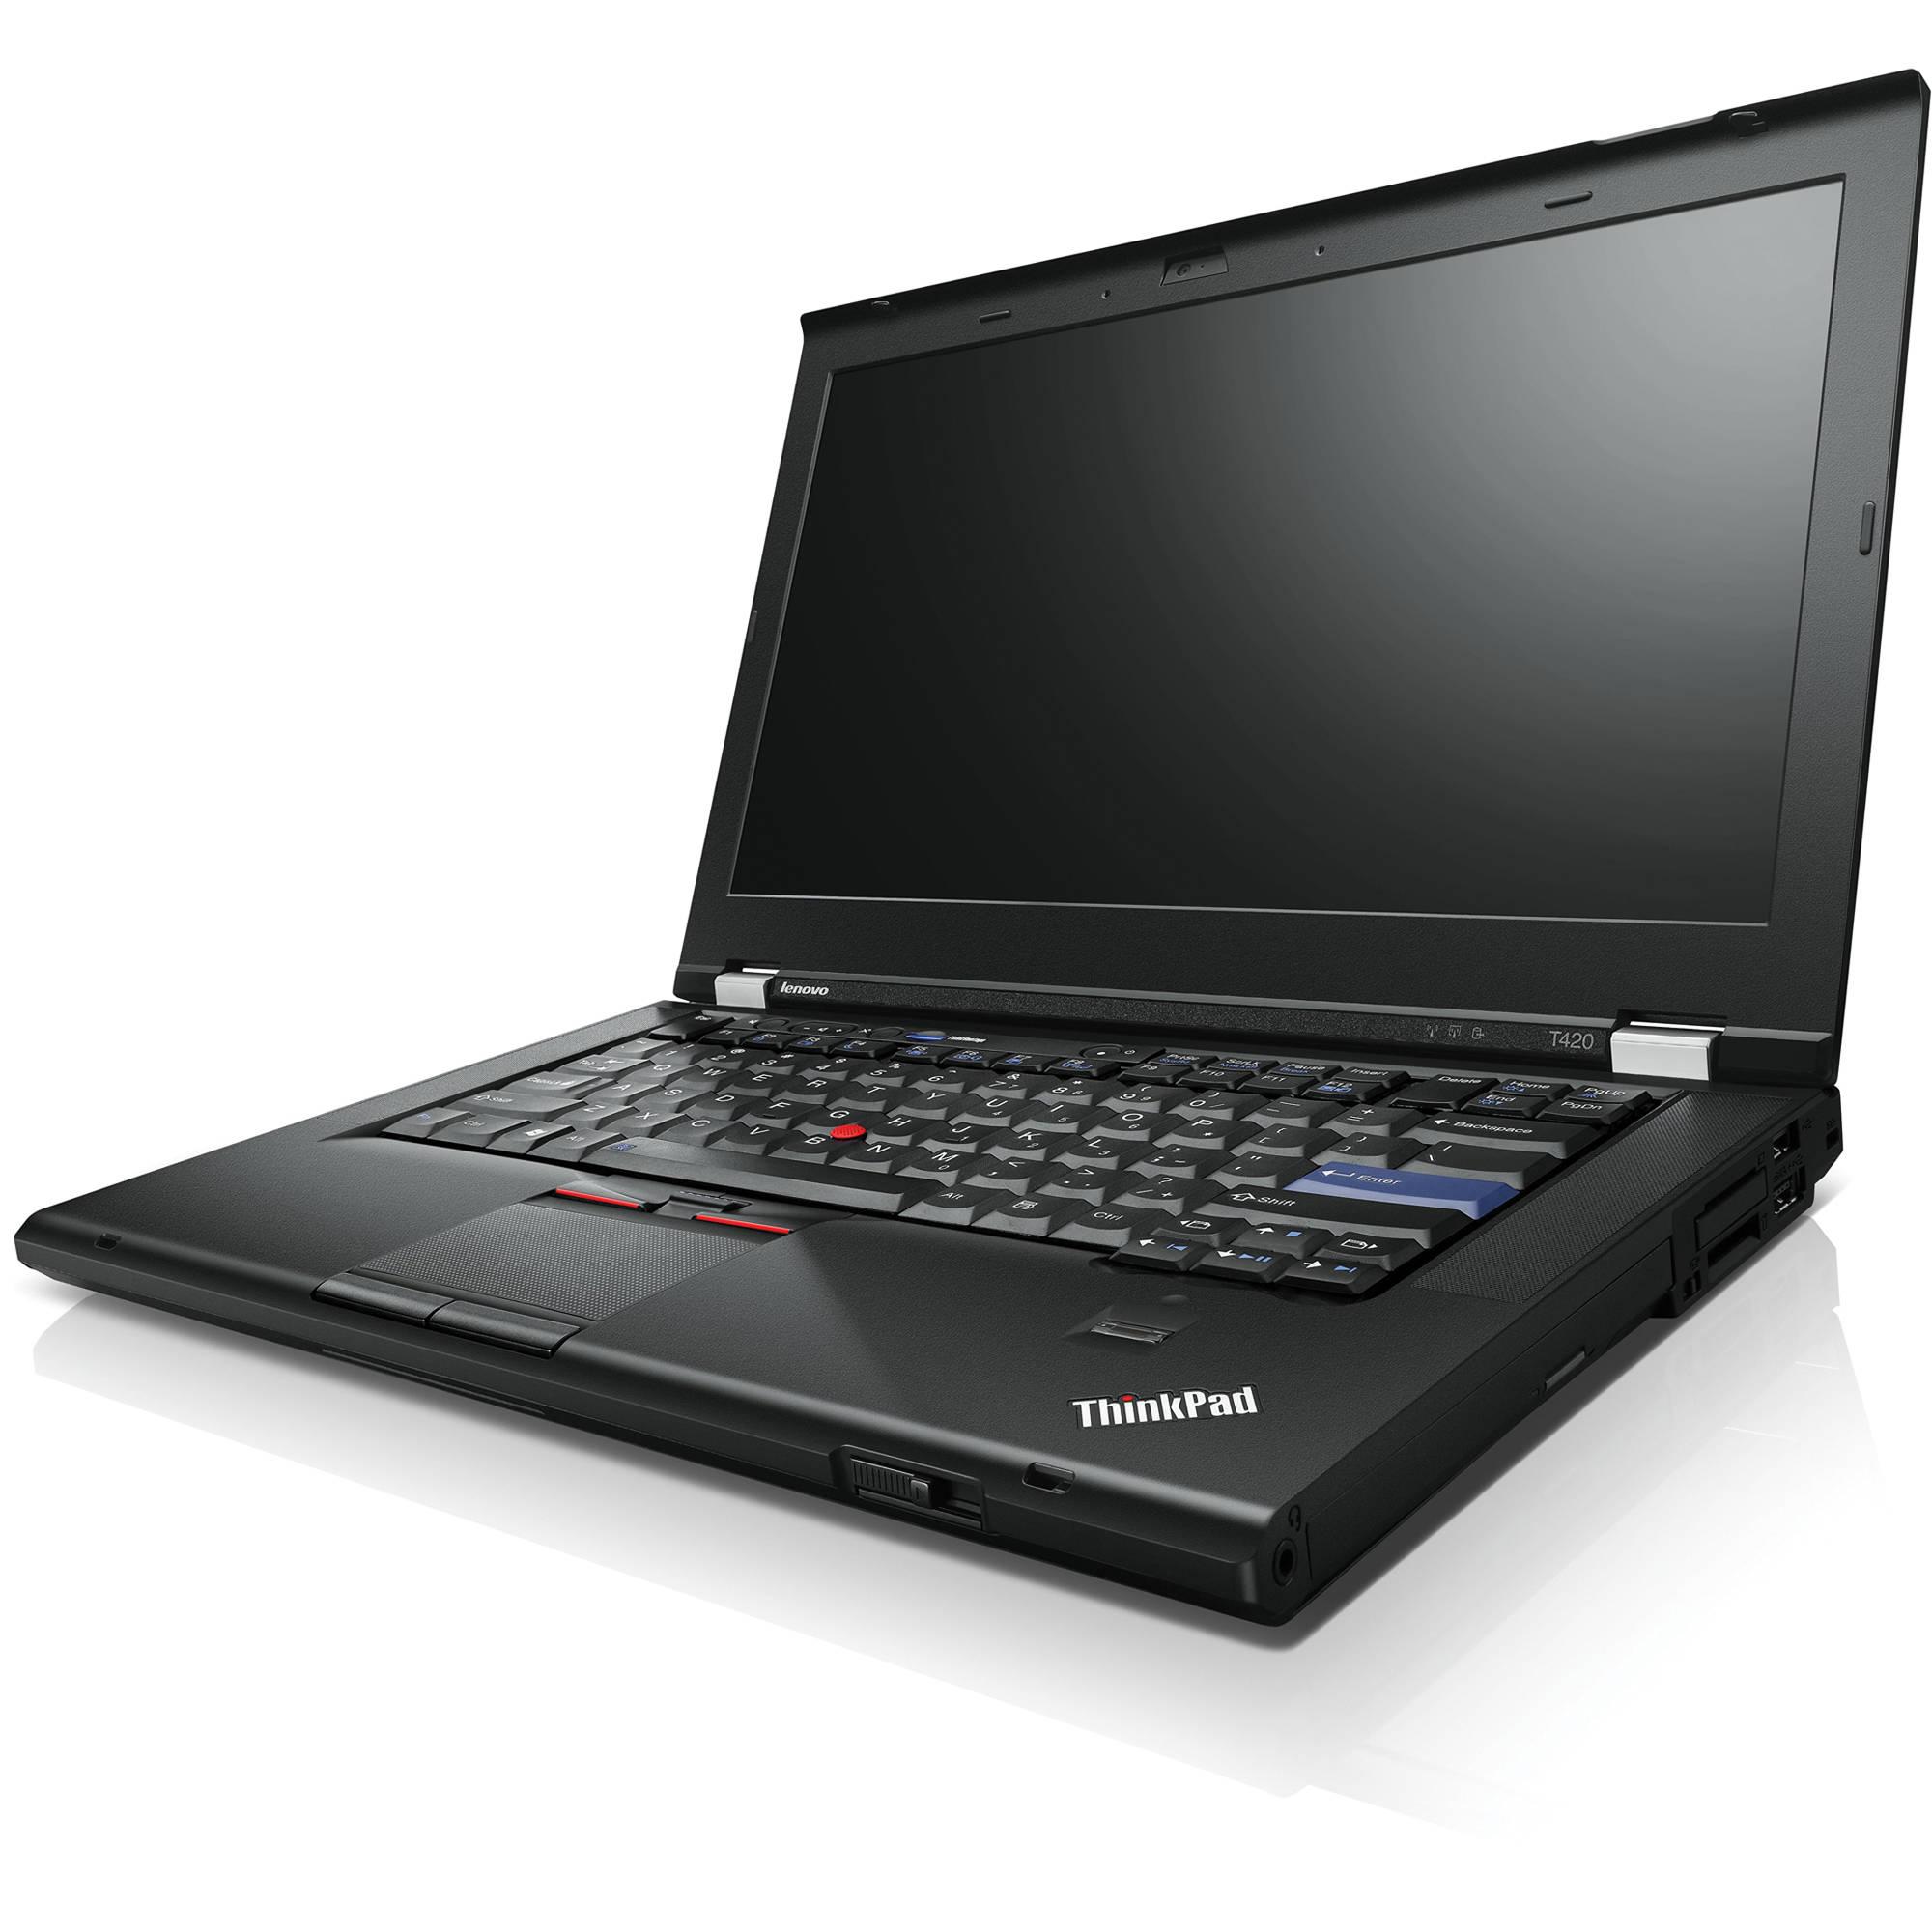 Lenovo ThinkPad T420 4178-C9U 14